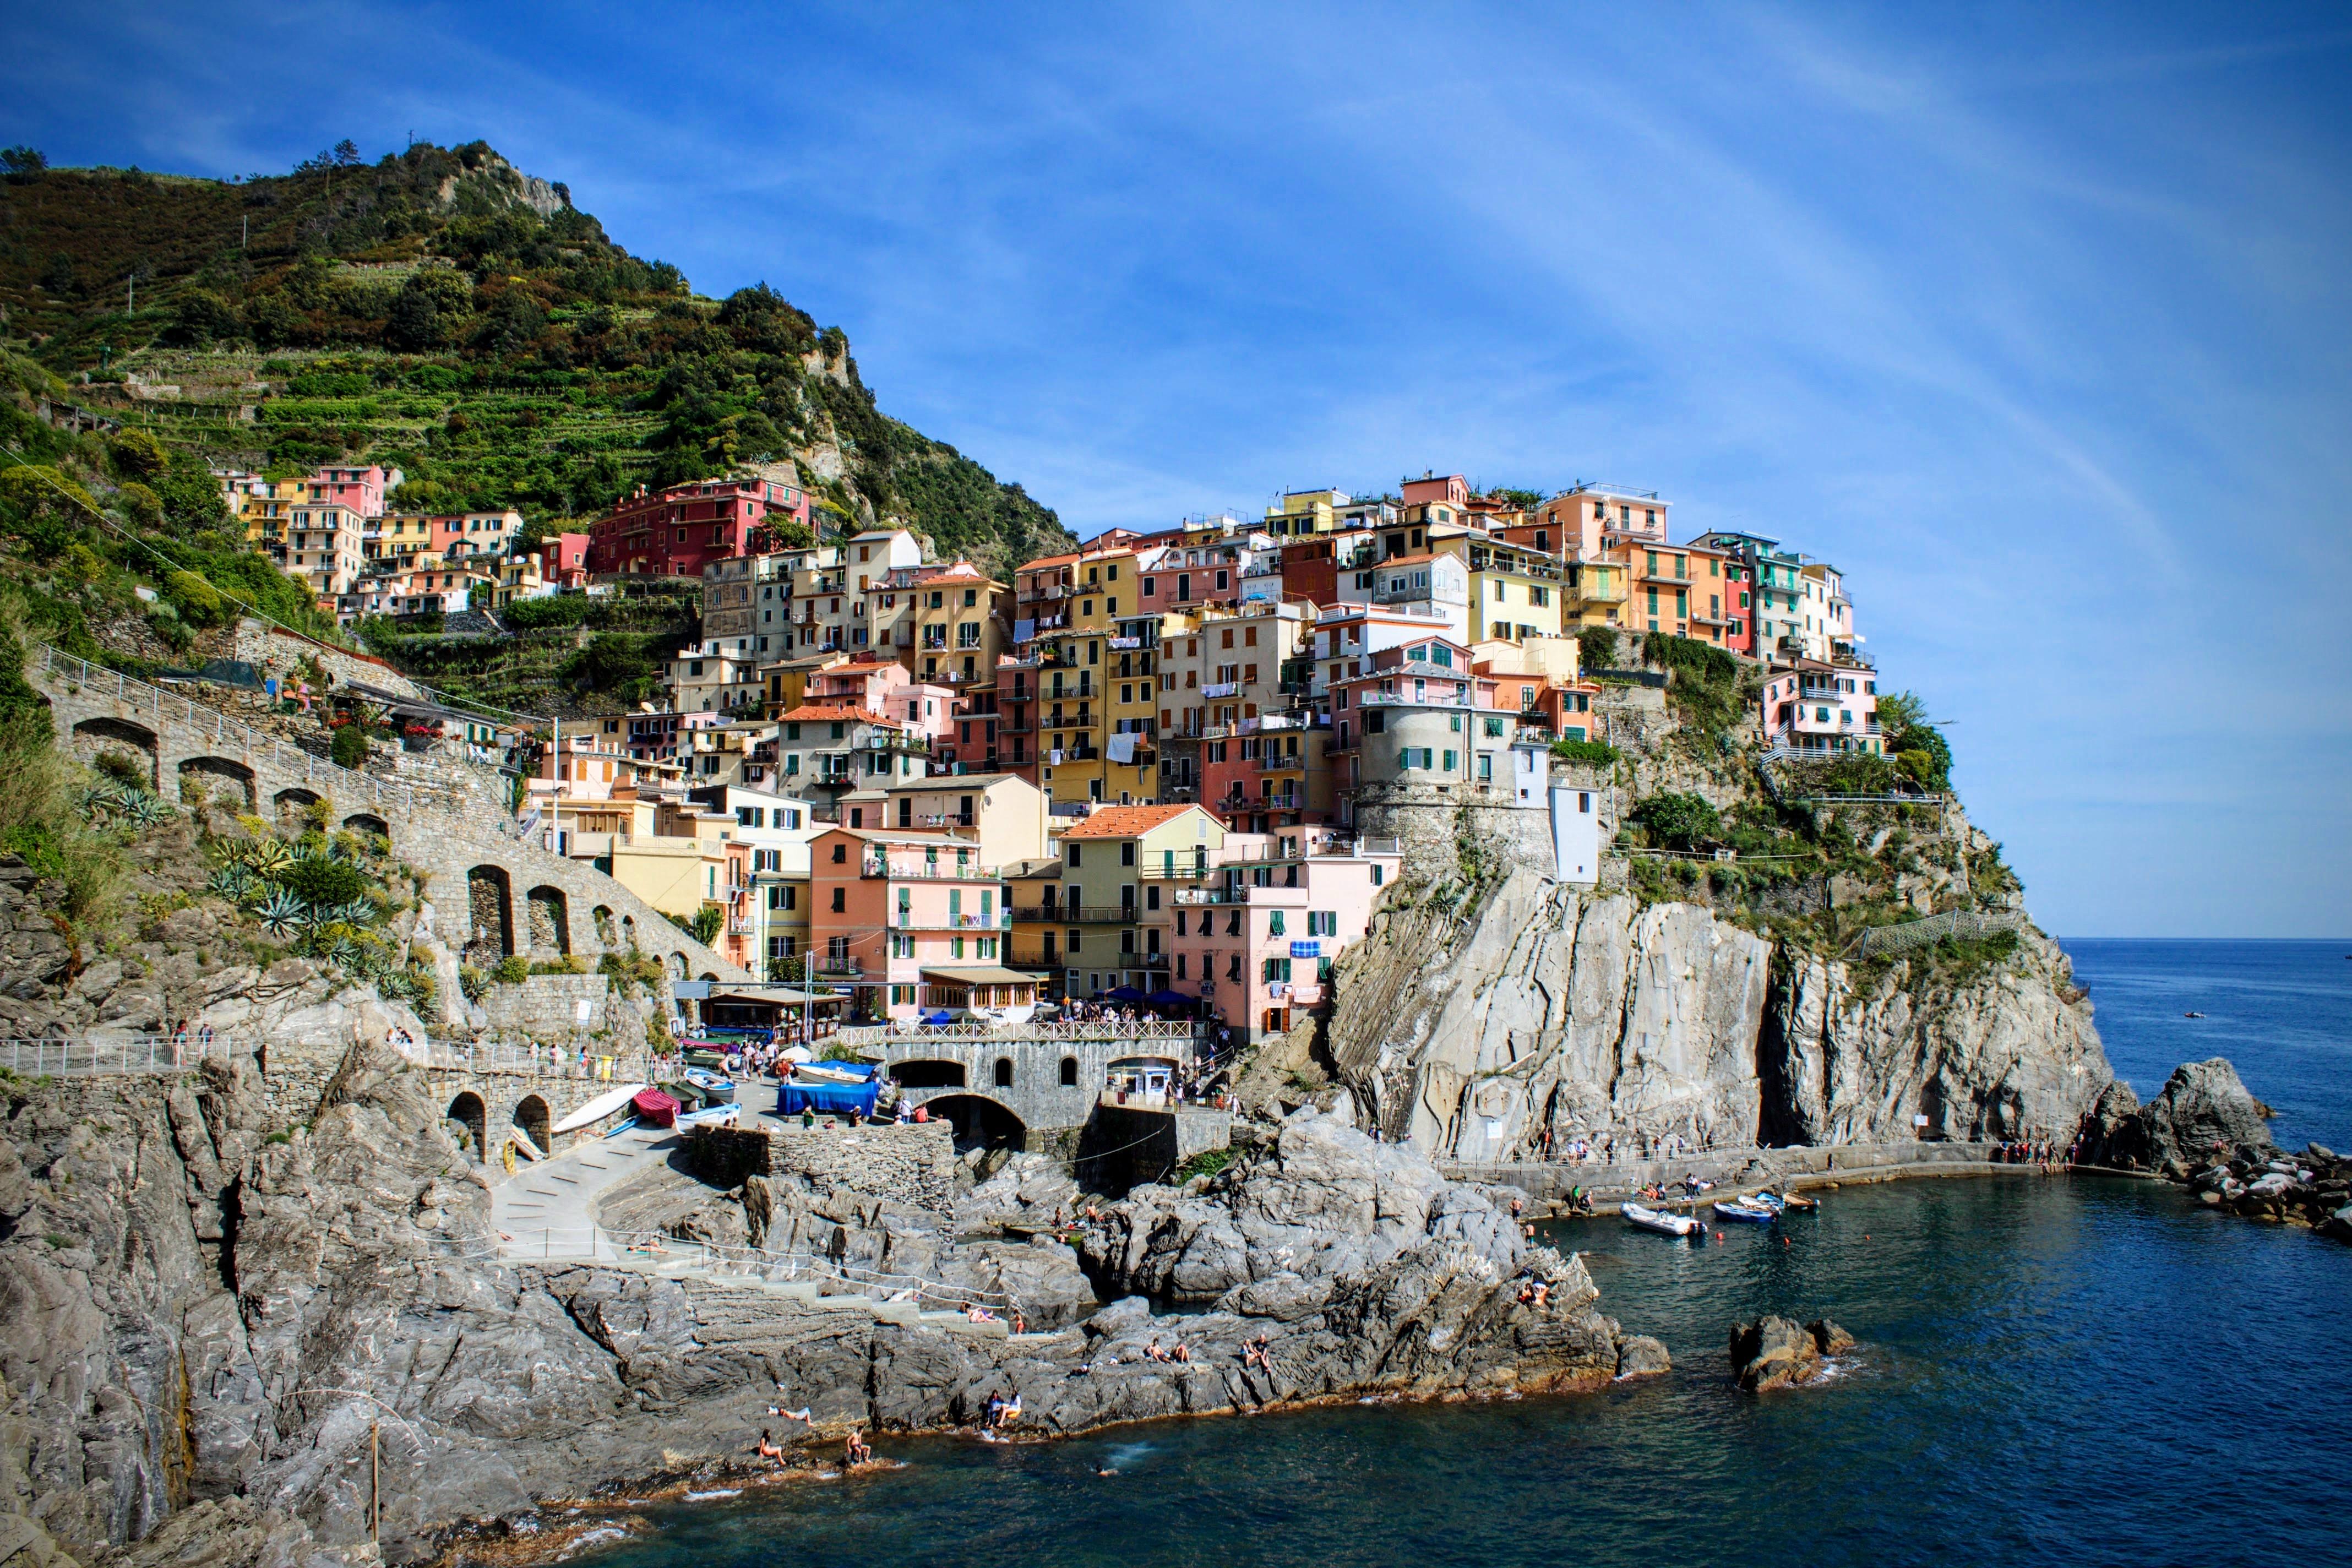 1 Visually Stunning Cinque Terre Is Comprised Of 5 Very Tiny Towns Clinging To The Cliffs Along Coast Italy Riomaggiore Corniglia Manarola